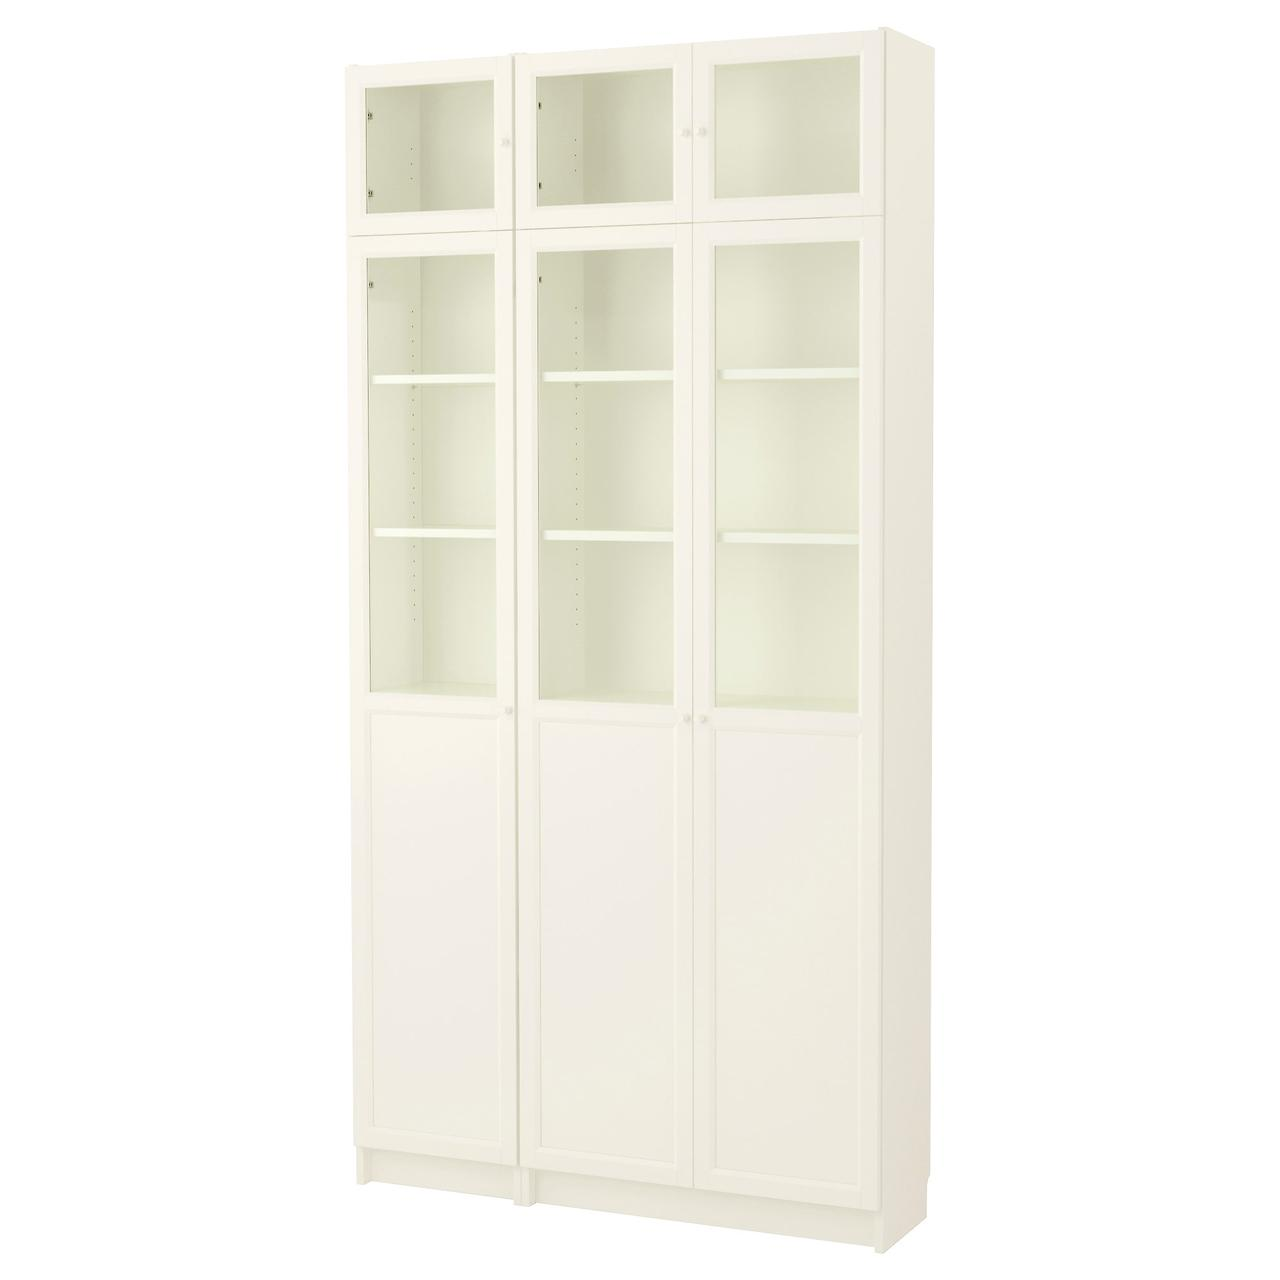 IKEA BILLY / OXBERG (592.177.24) Шкаф/Сервант